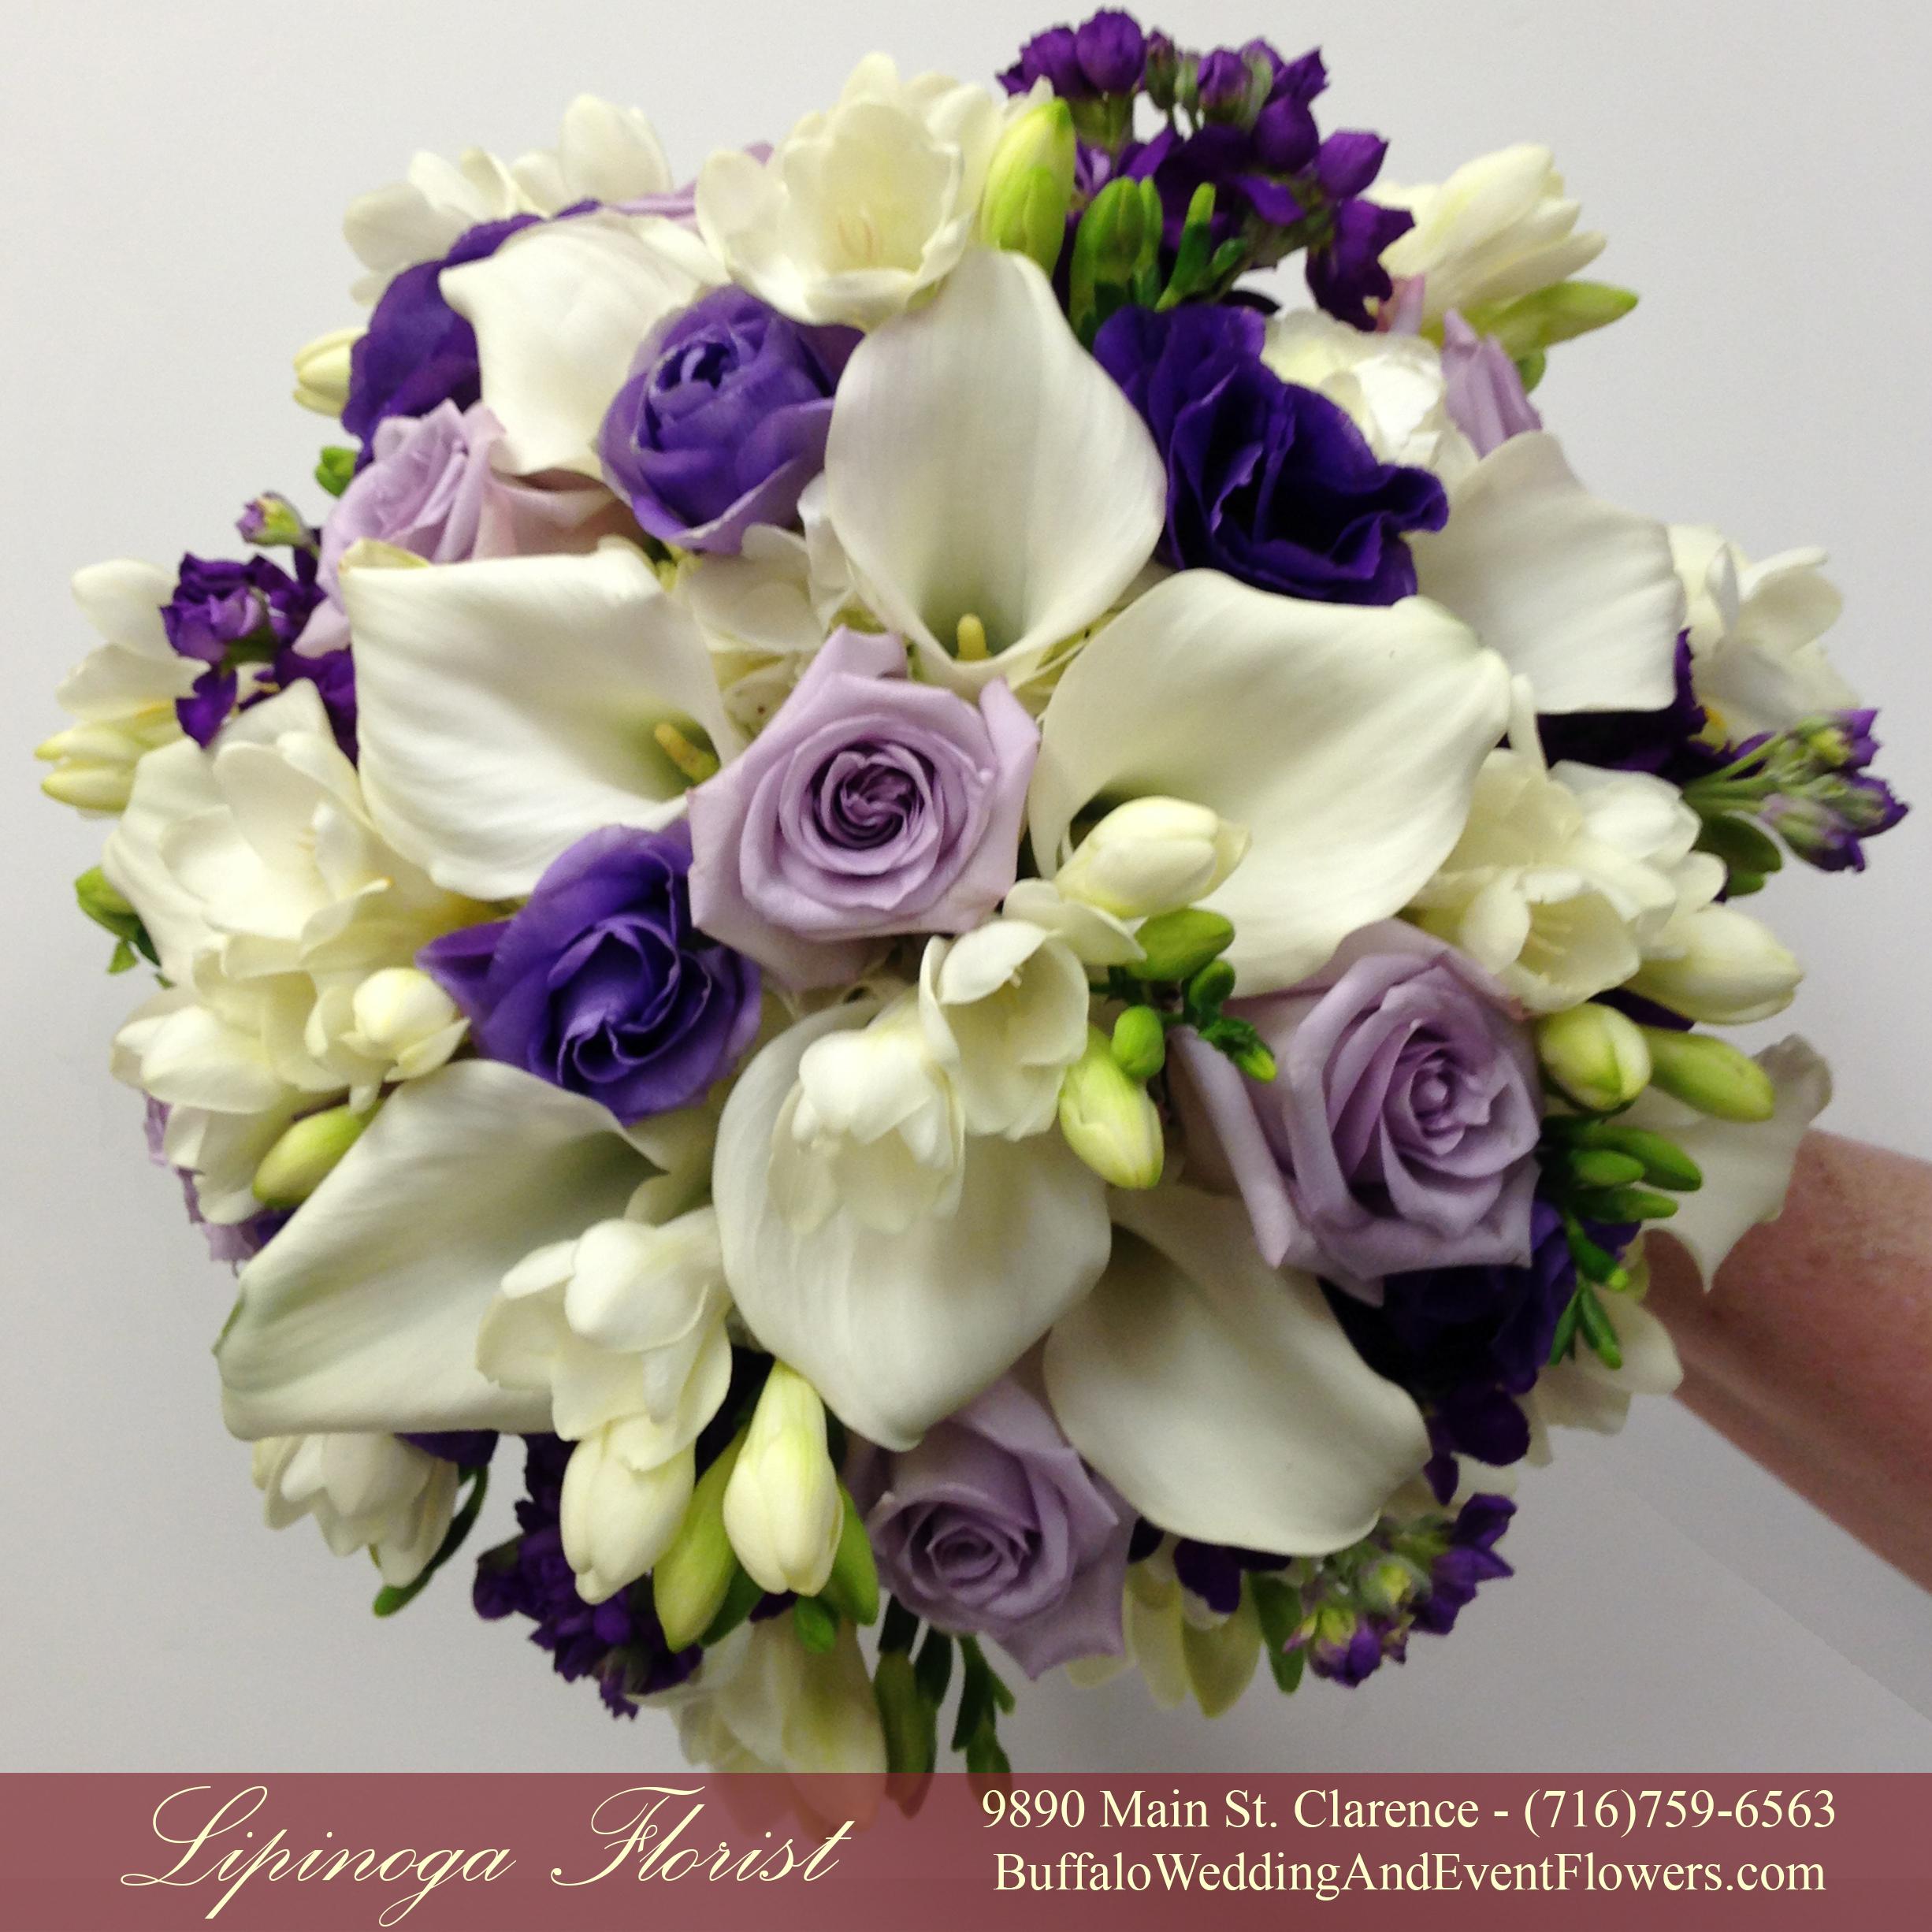 Tall Centerpieces Buffalo Wedding Event Flowers By Lipinoga Florist